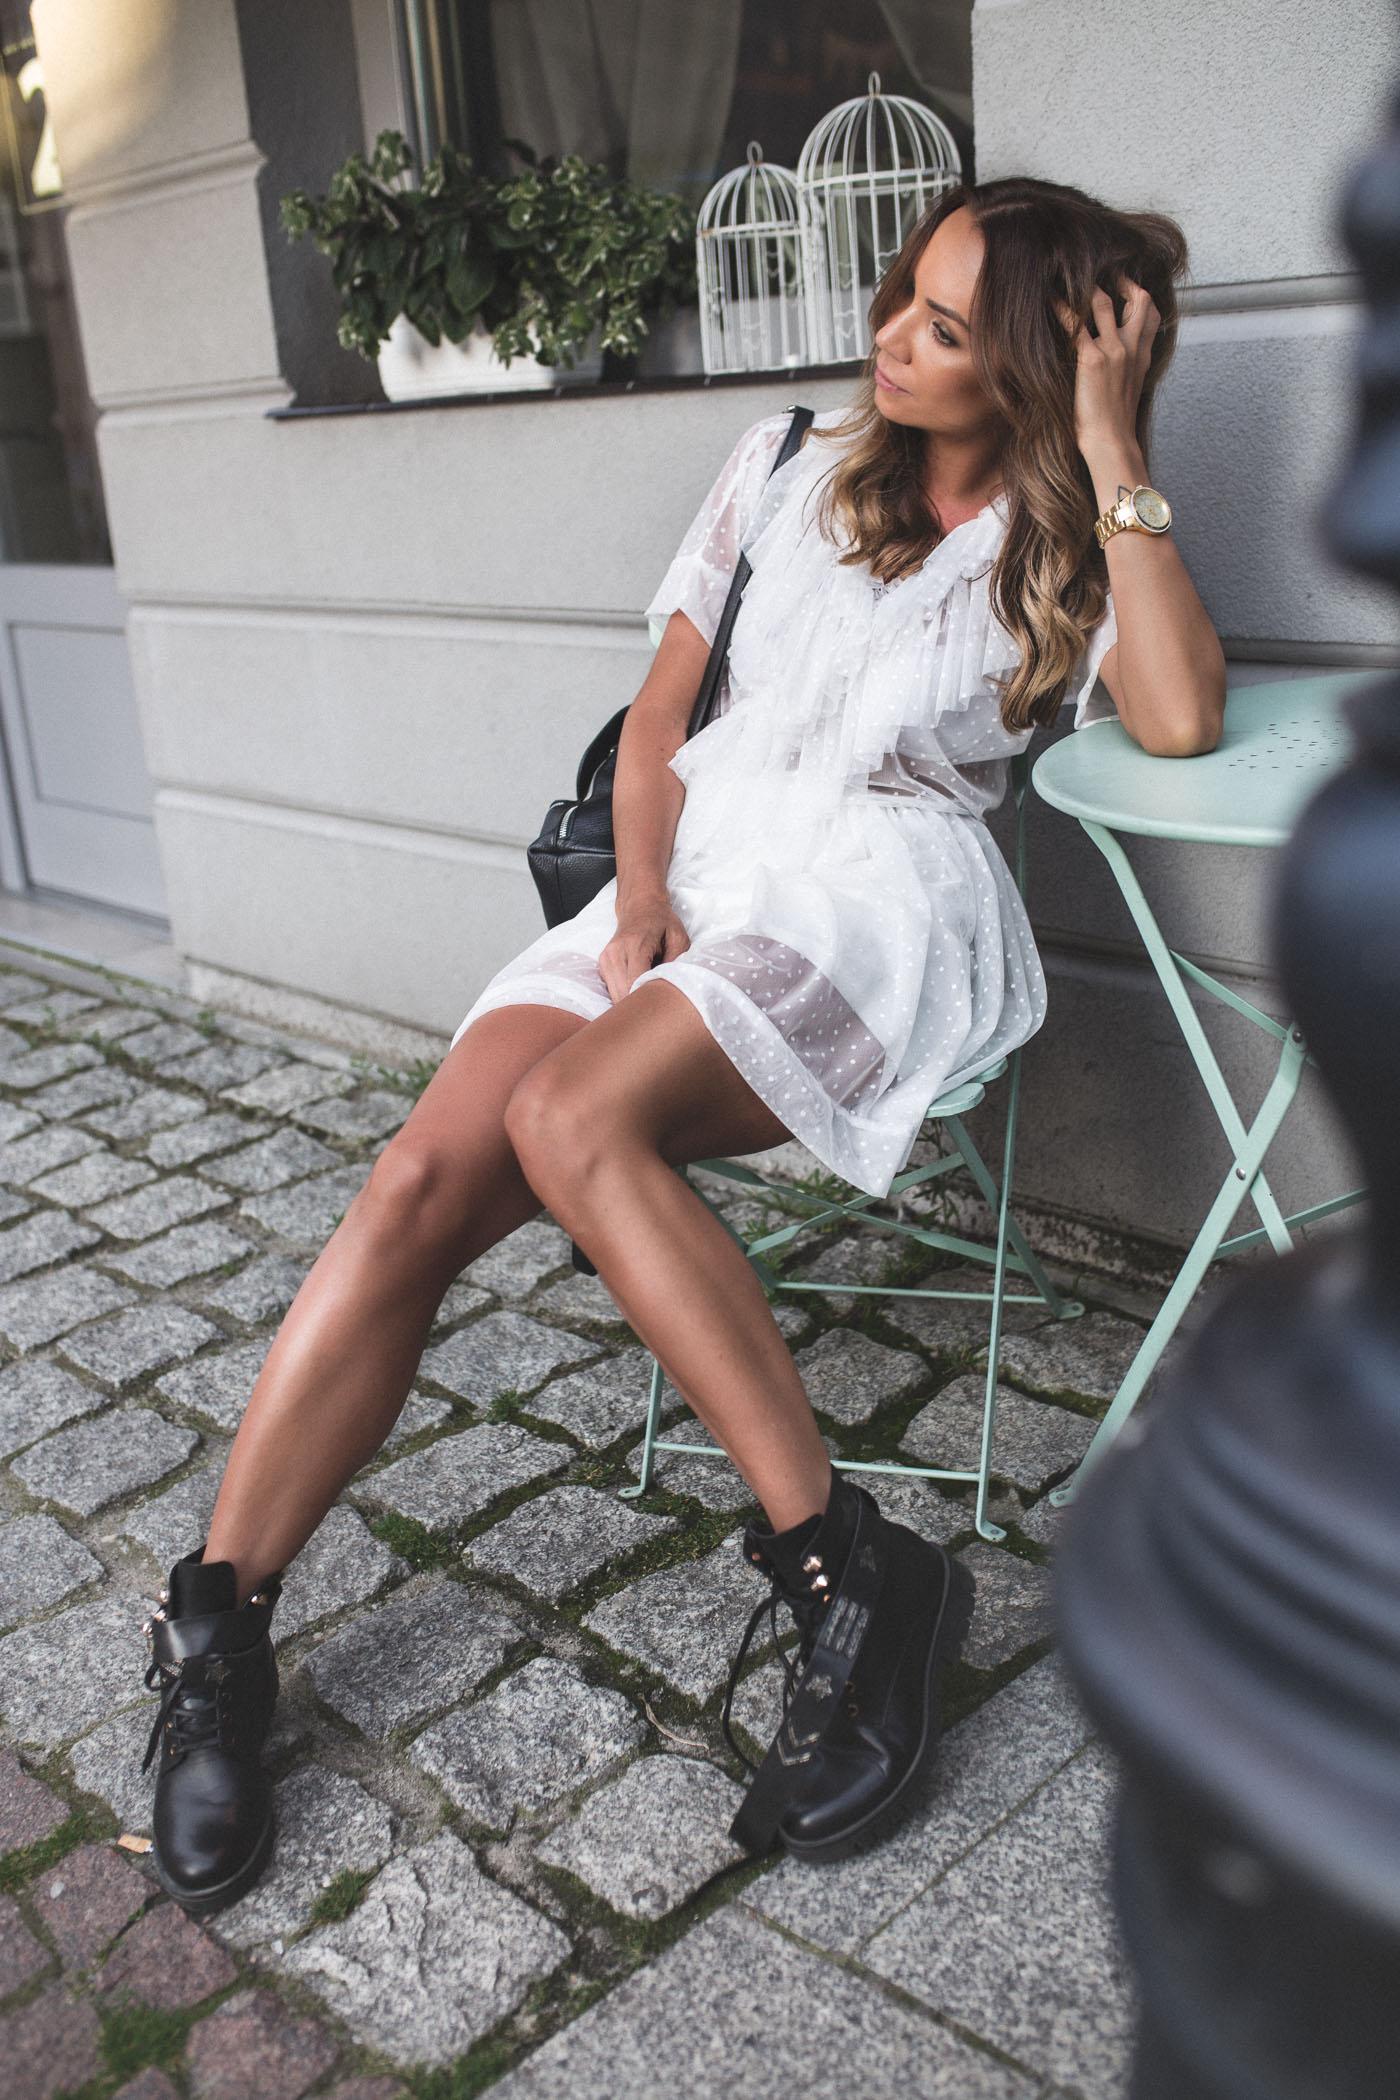 Sukienka Monika Świderska, botki biker boots, botki carinii, botki eobuwie